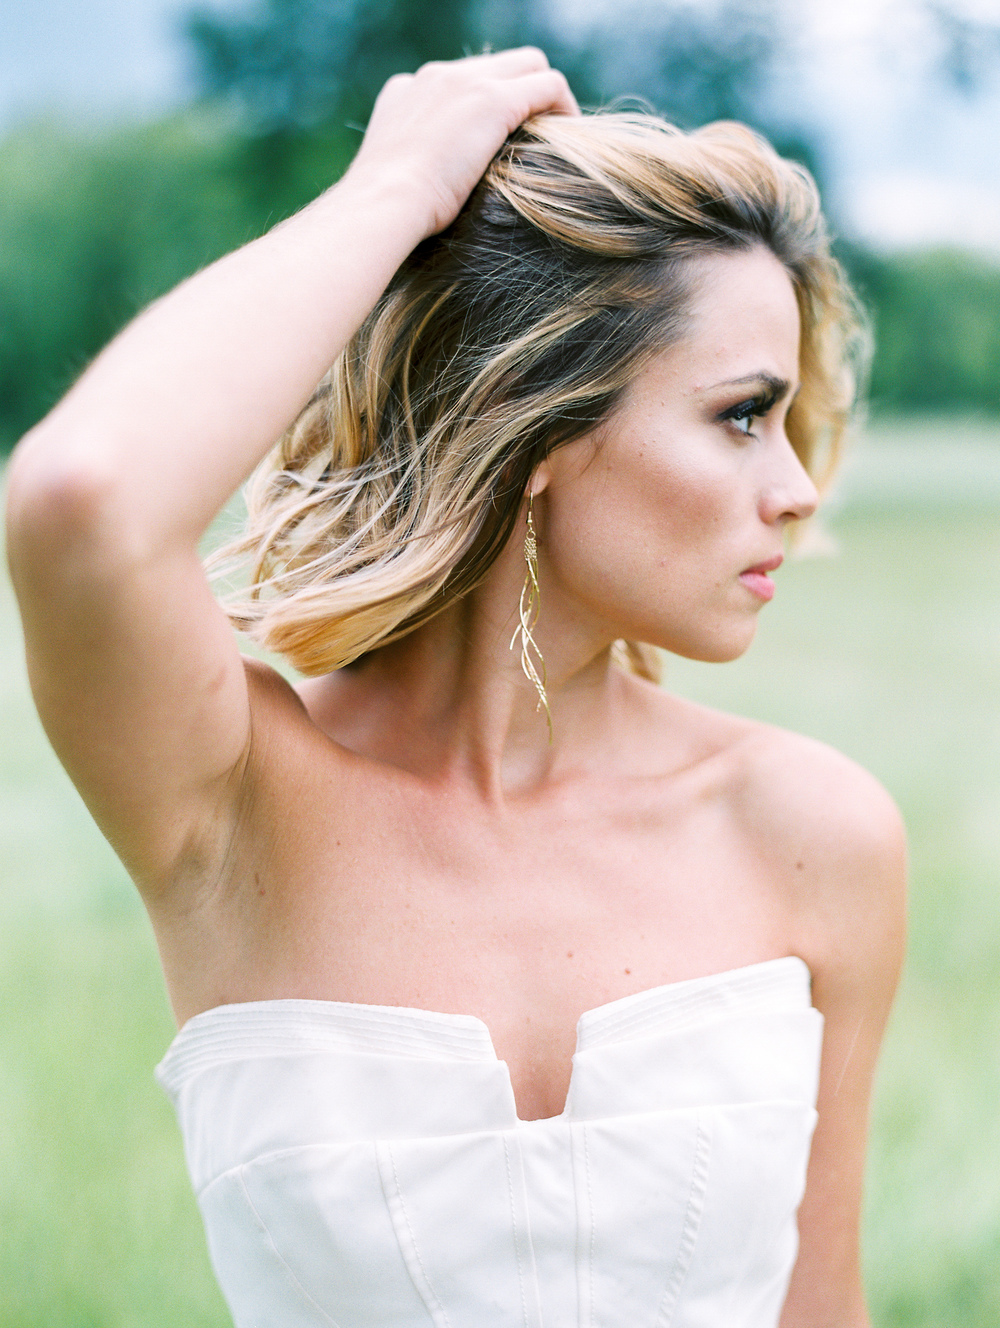 Dana-Fernandez-Photography-Houston-Wedding-Photographer-Film-100-Layer-Cake-Wedding-Inspiration-Destination-6.jpg